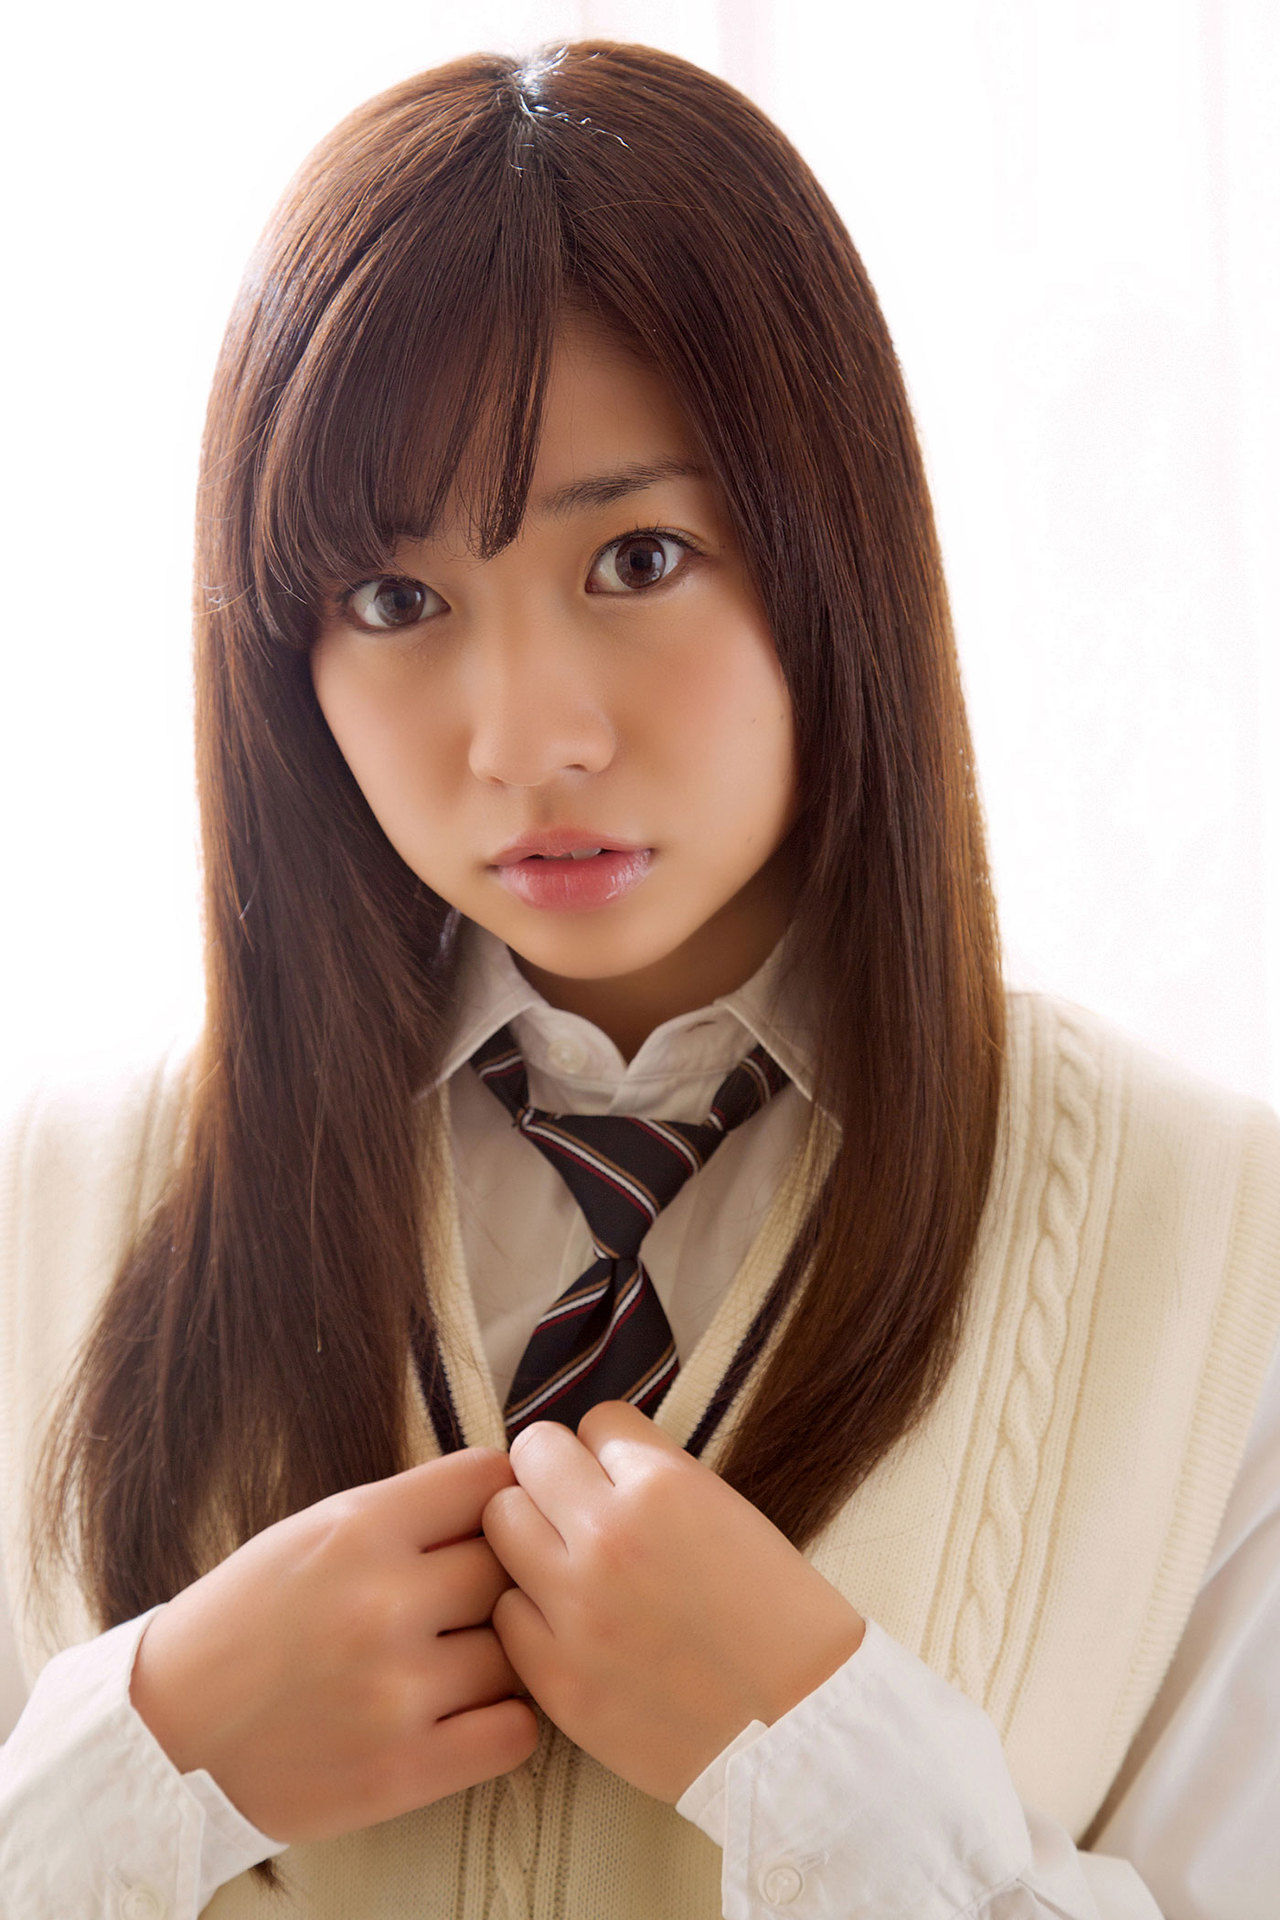 Onuki Ayaka Onuki takes off her school uniform and wears a white bikini002